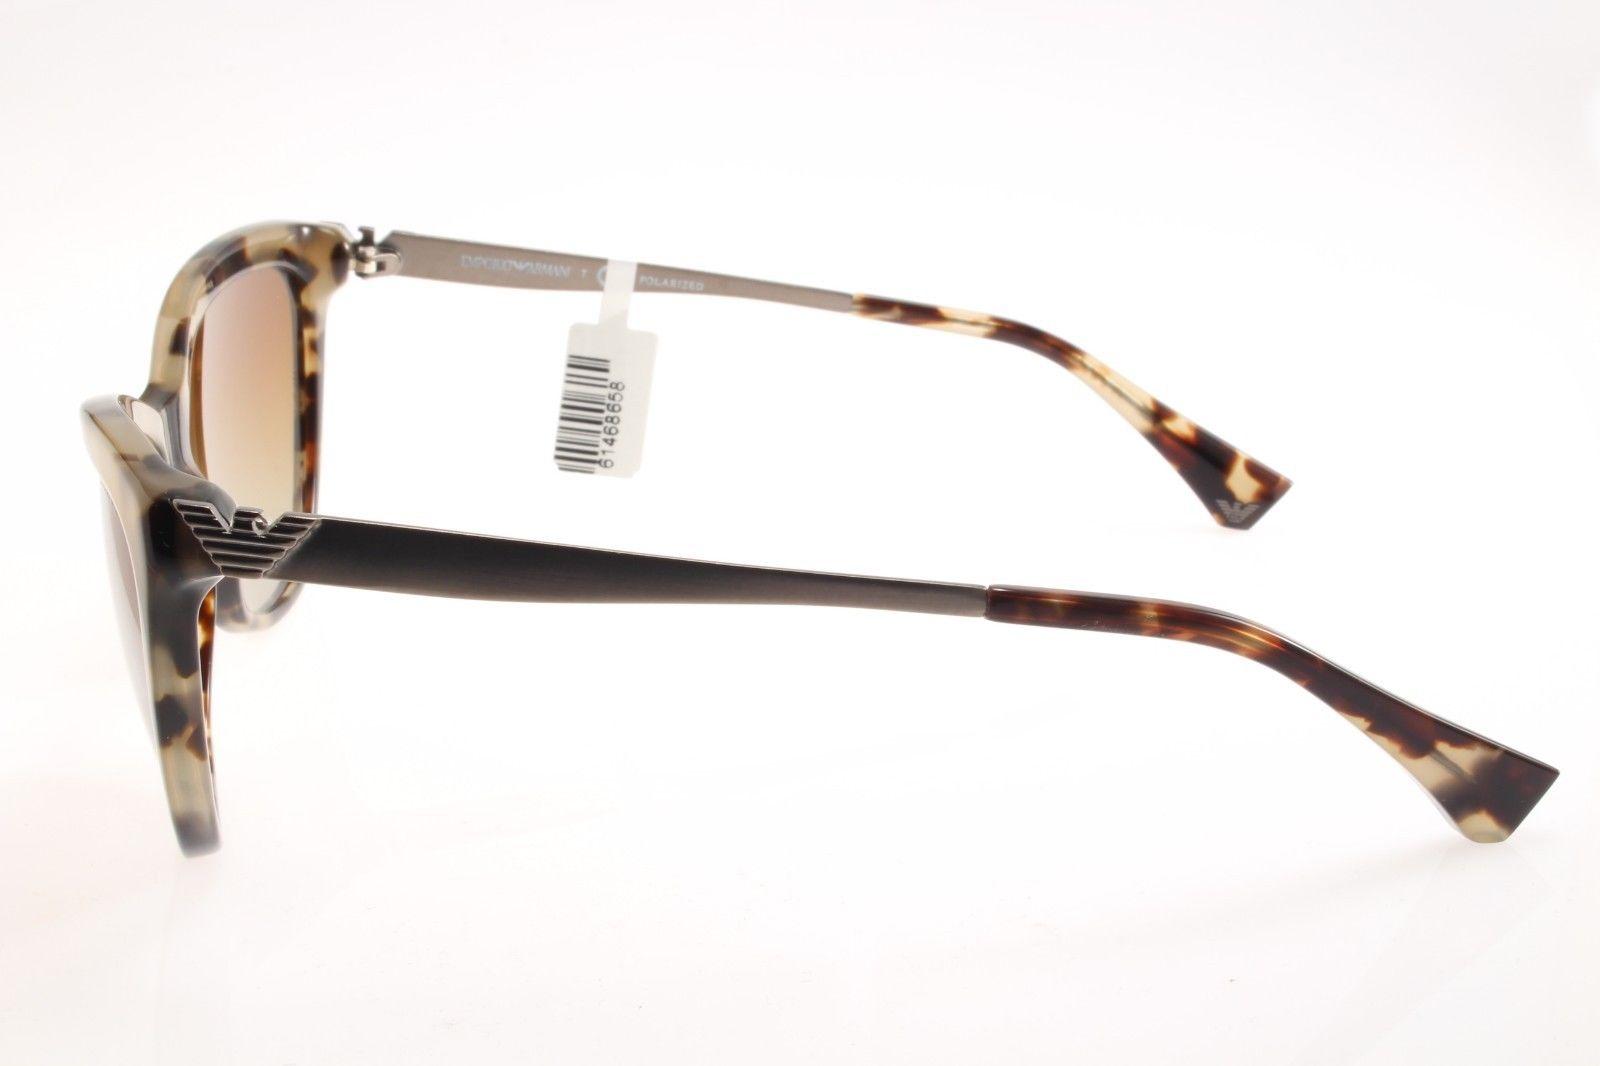 5c6fb867e9ed New original Emporio Armani EA 4030 5234 T5 57 Women Sunglasses Havana  Polarized